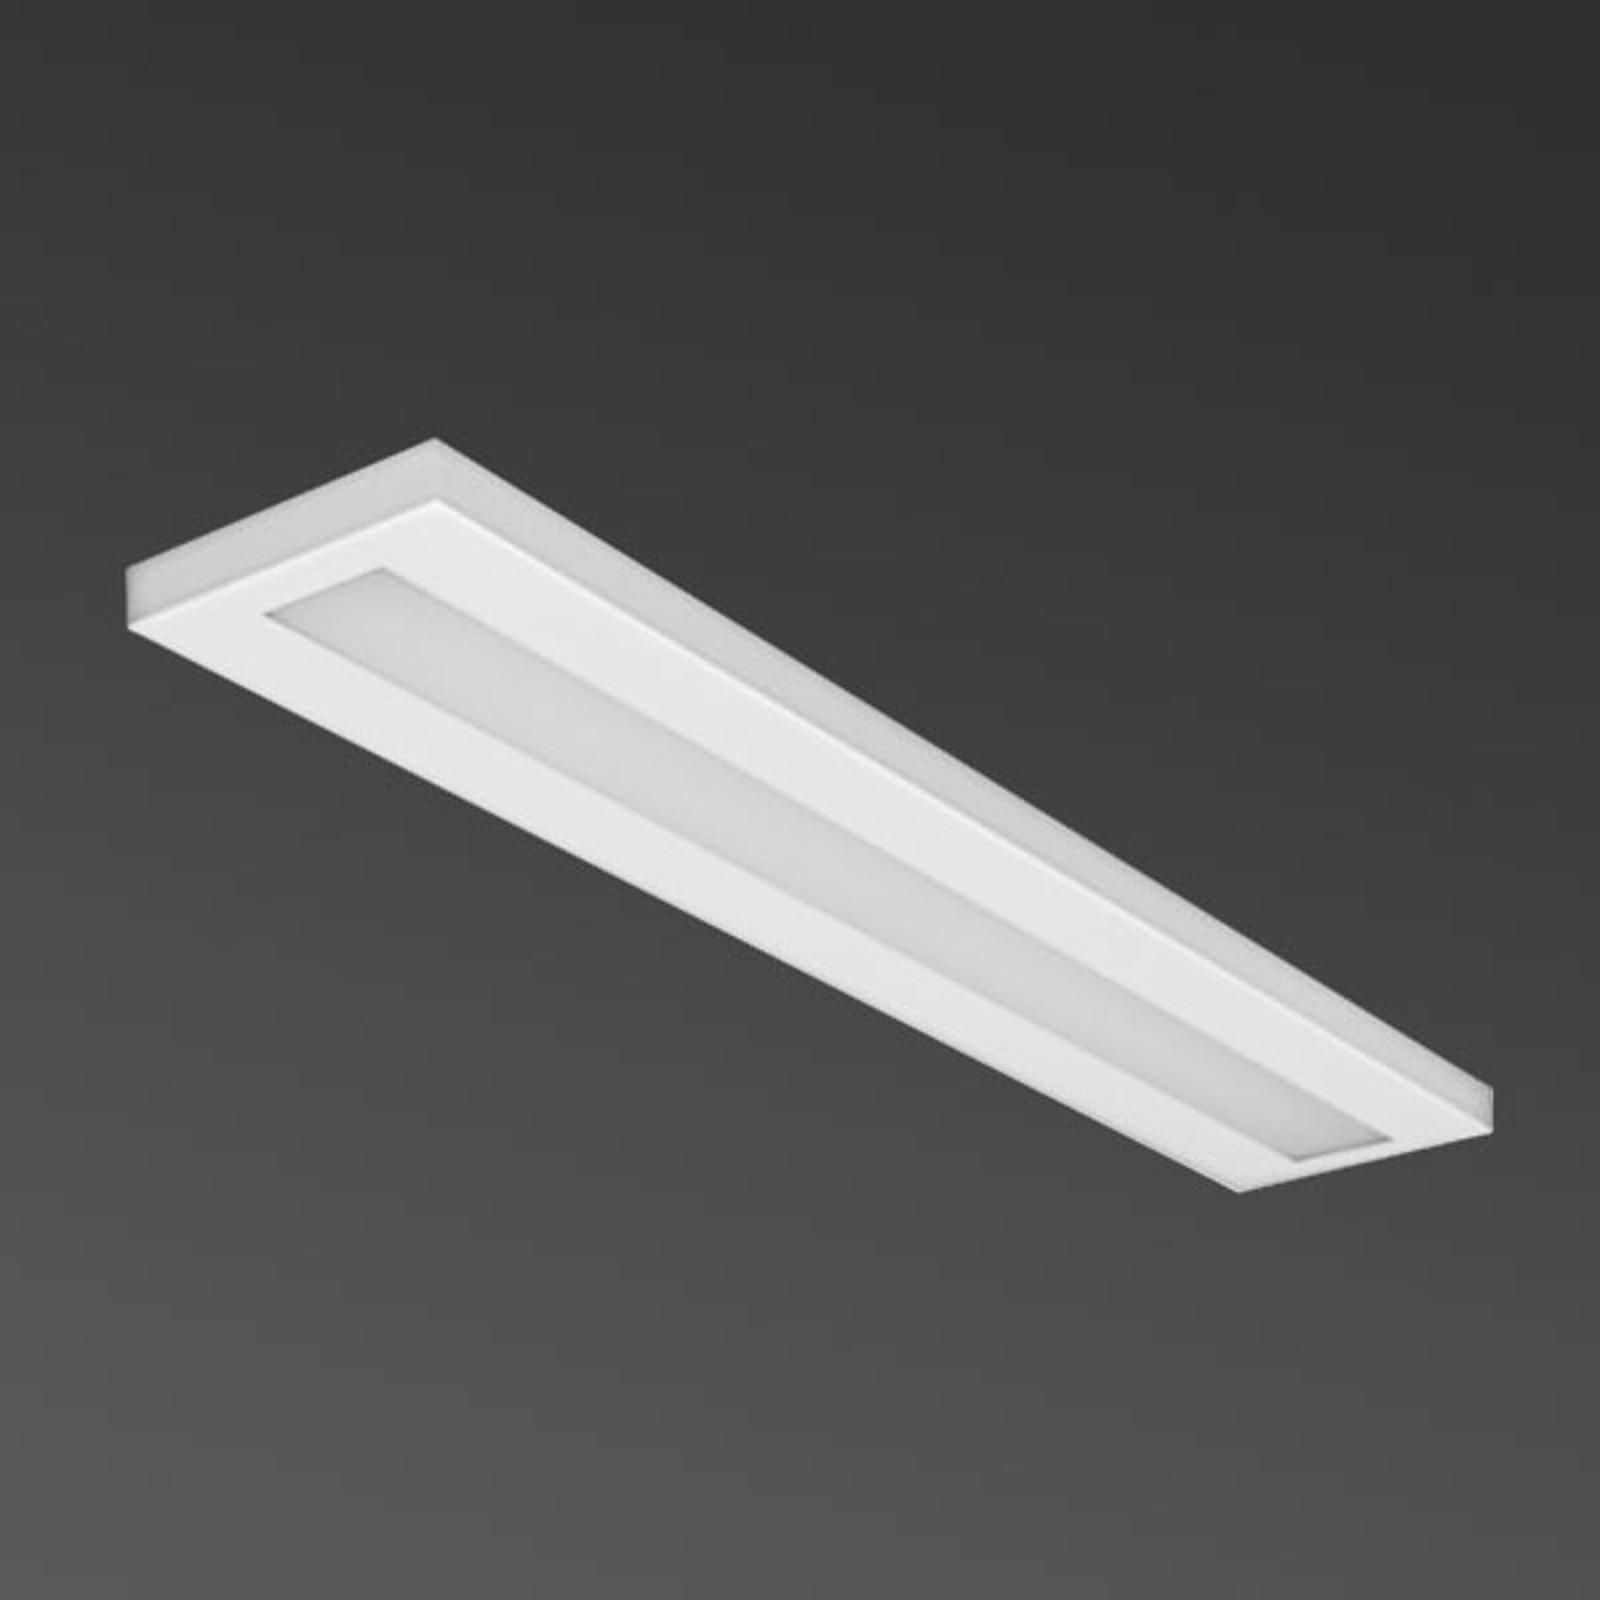 LED a superficie bianco, rettangolare 48 W 3000 K